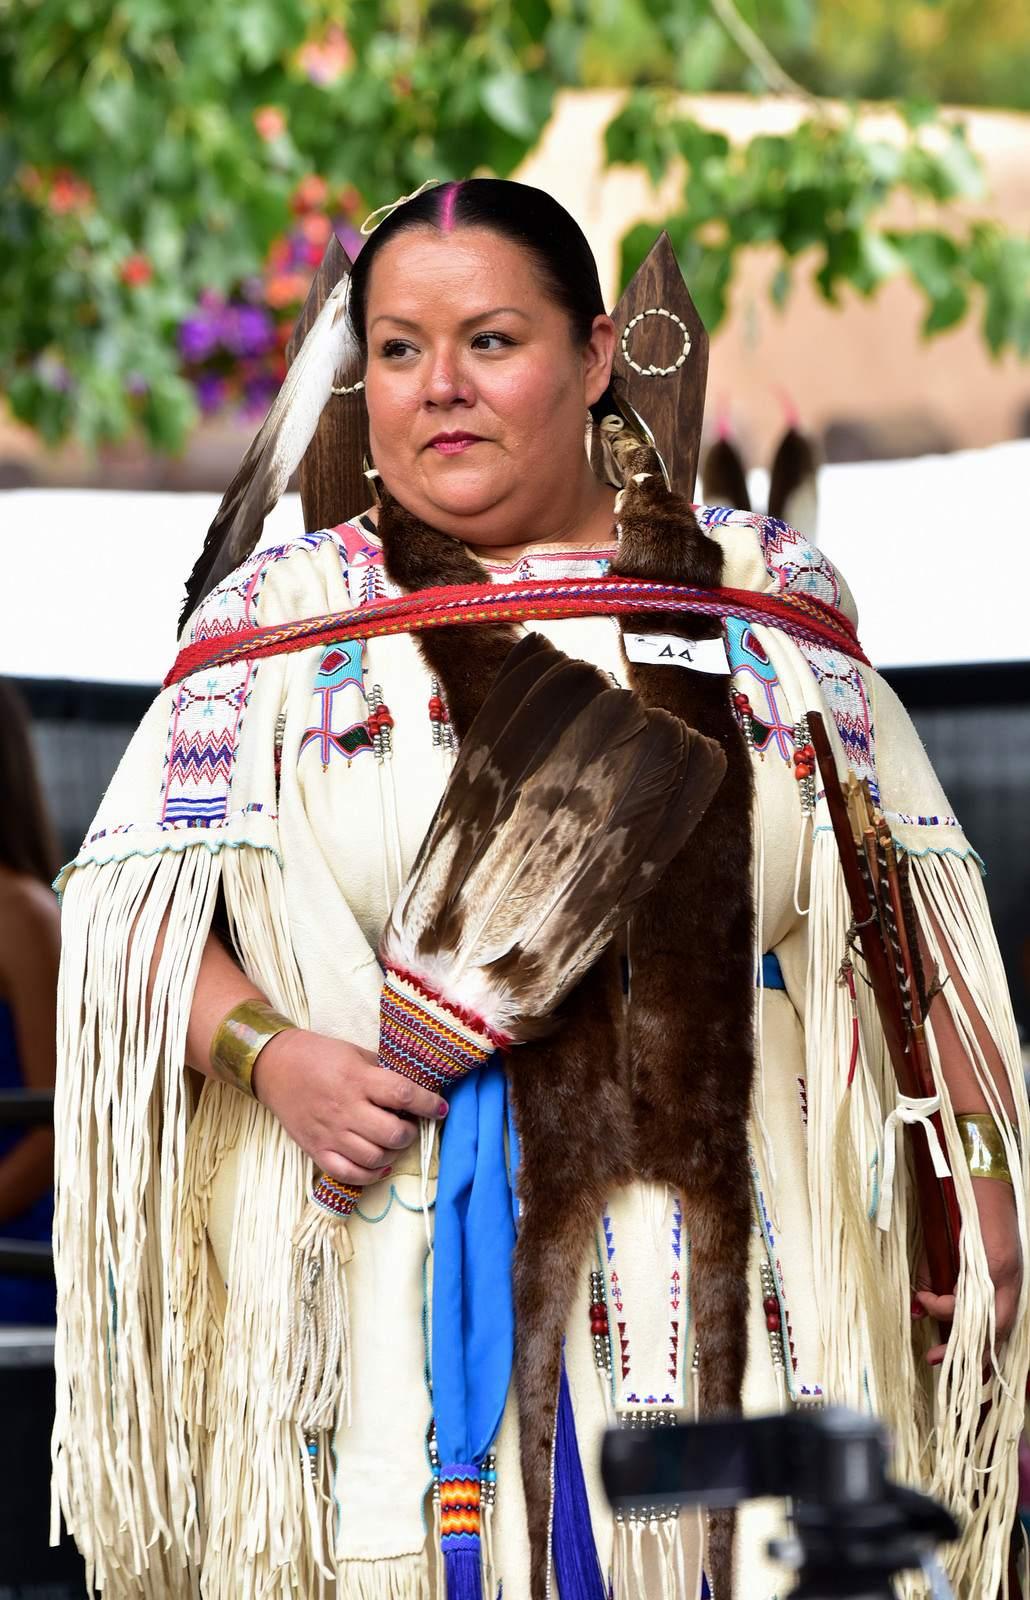 native american clothing9 Native American Clothing Contest at Santa Fe Indian Market